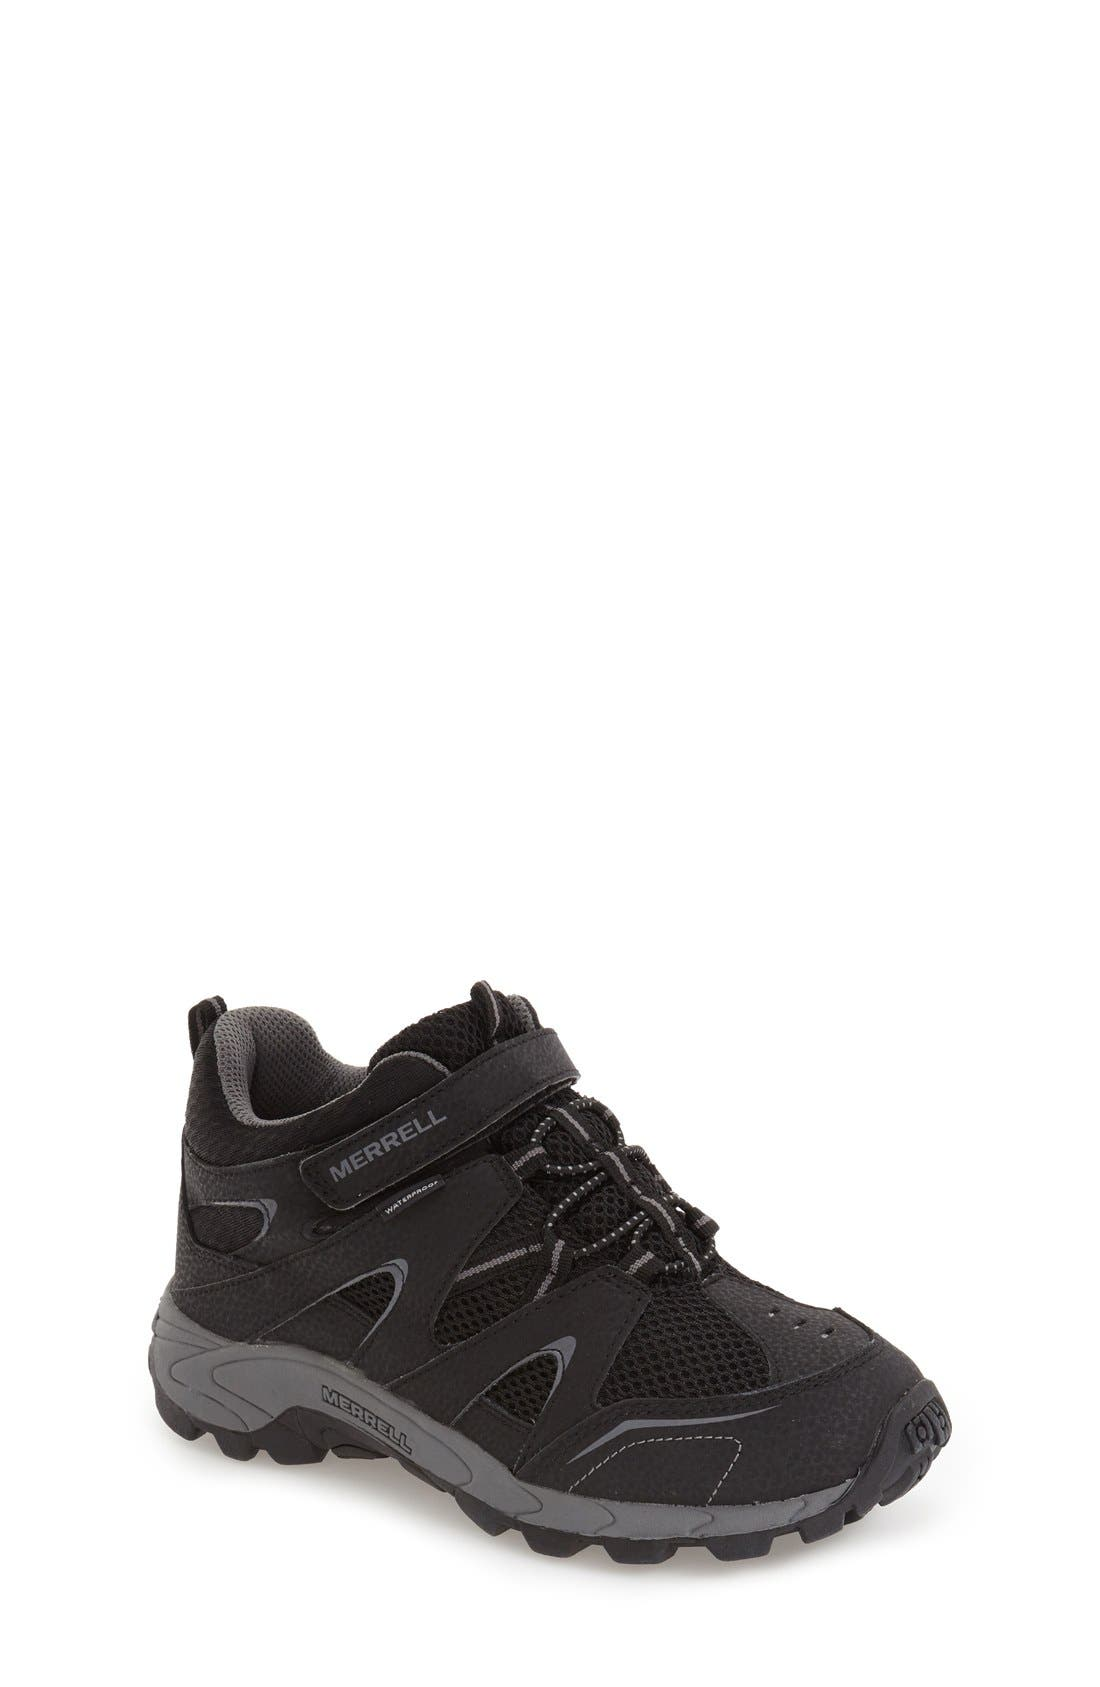 'Hilltop' Waterproof Sneaker,                             Main thumbnail 1, color,                             001